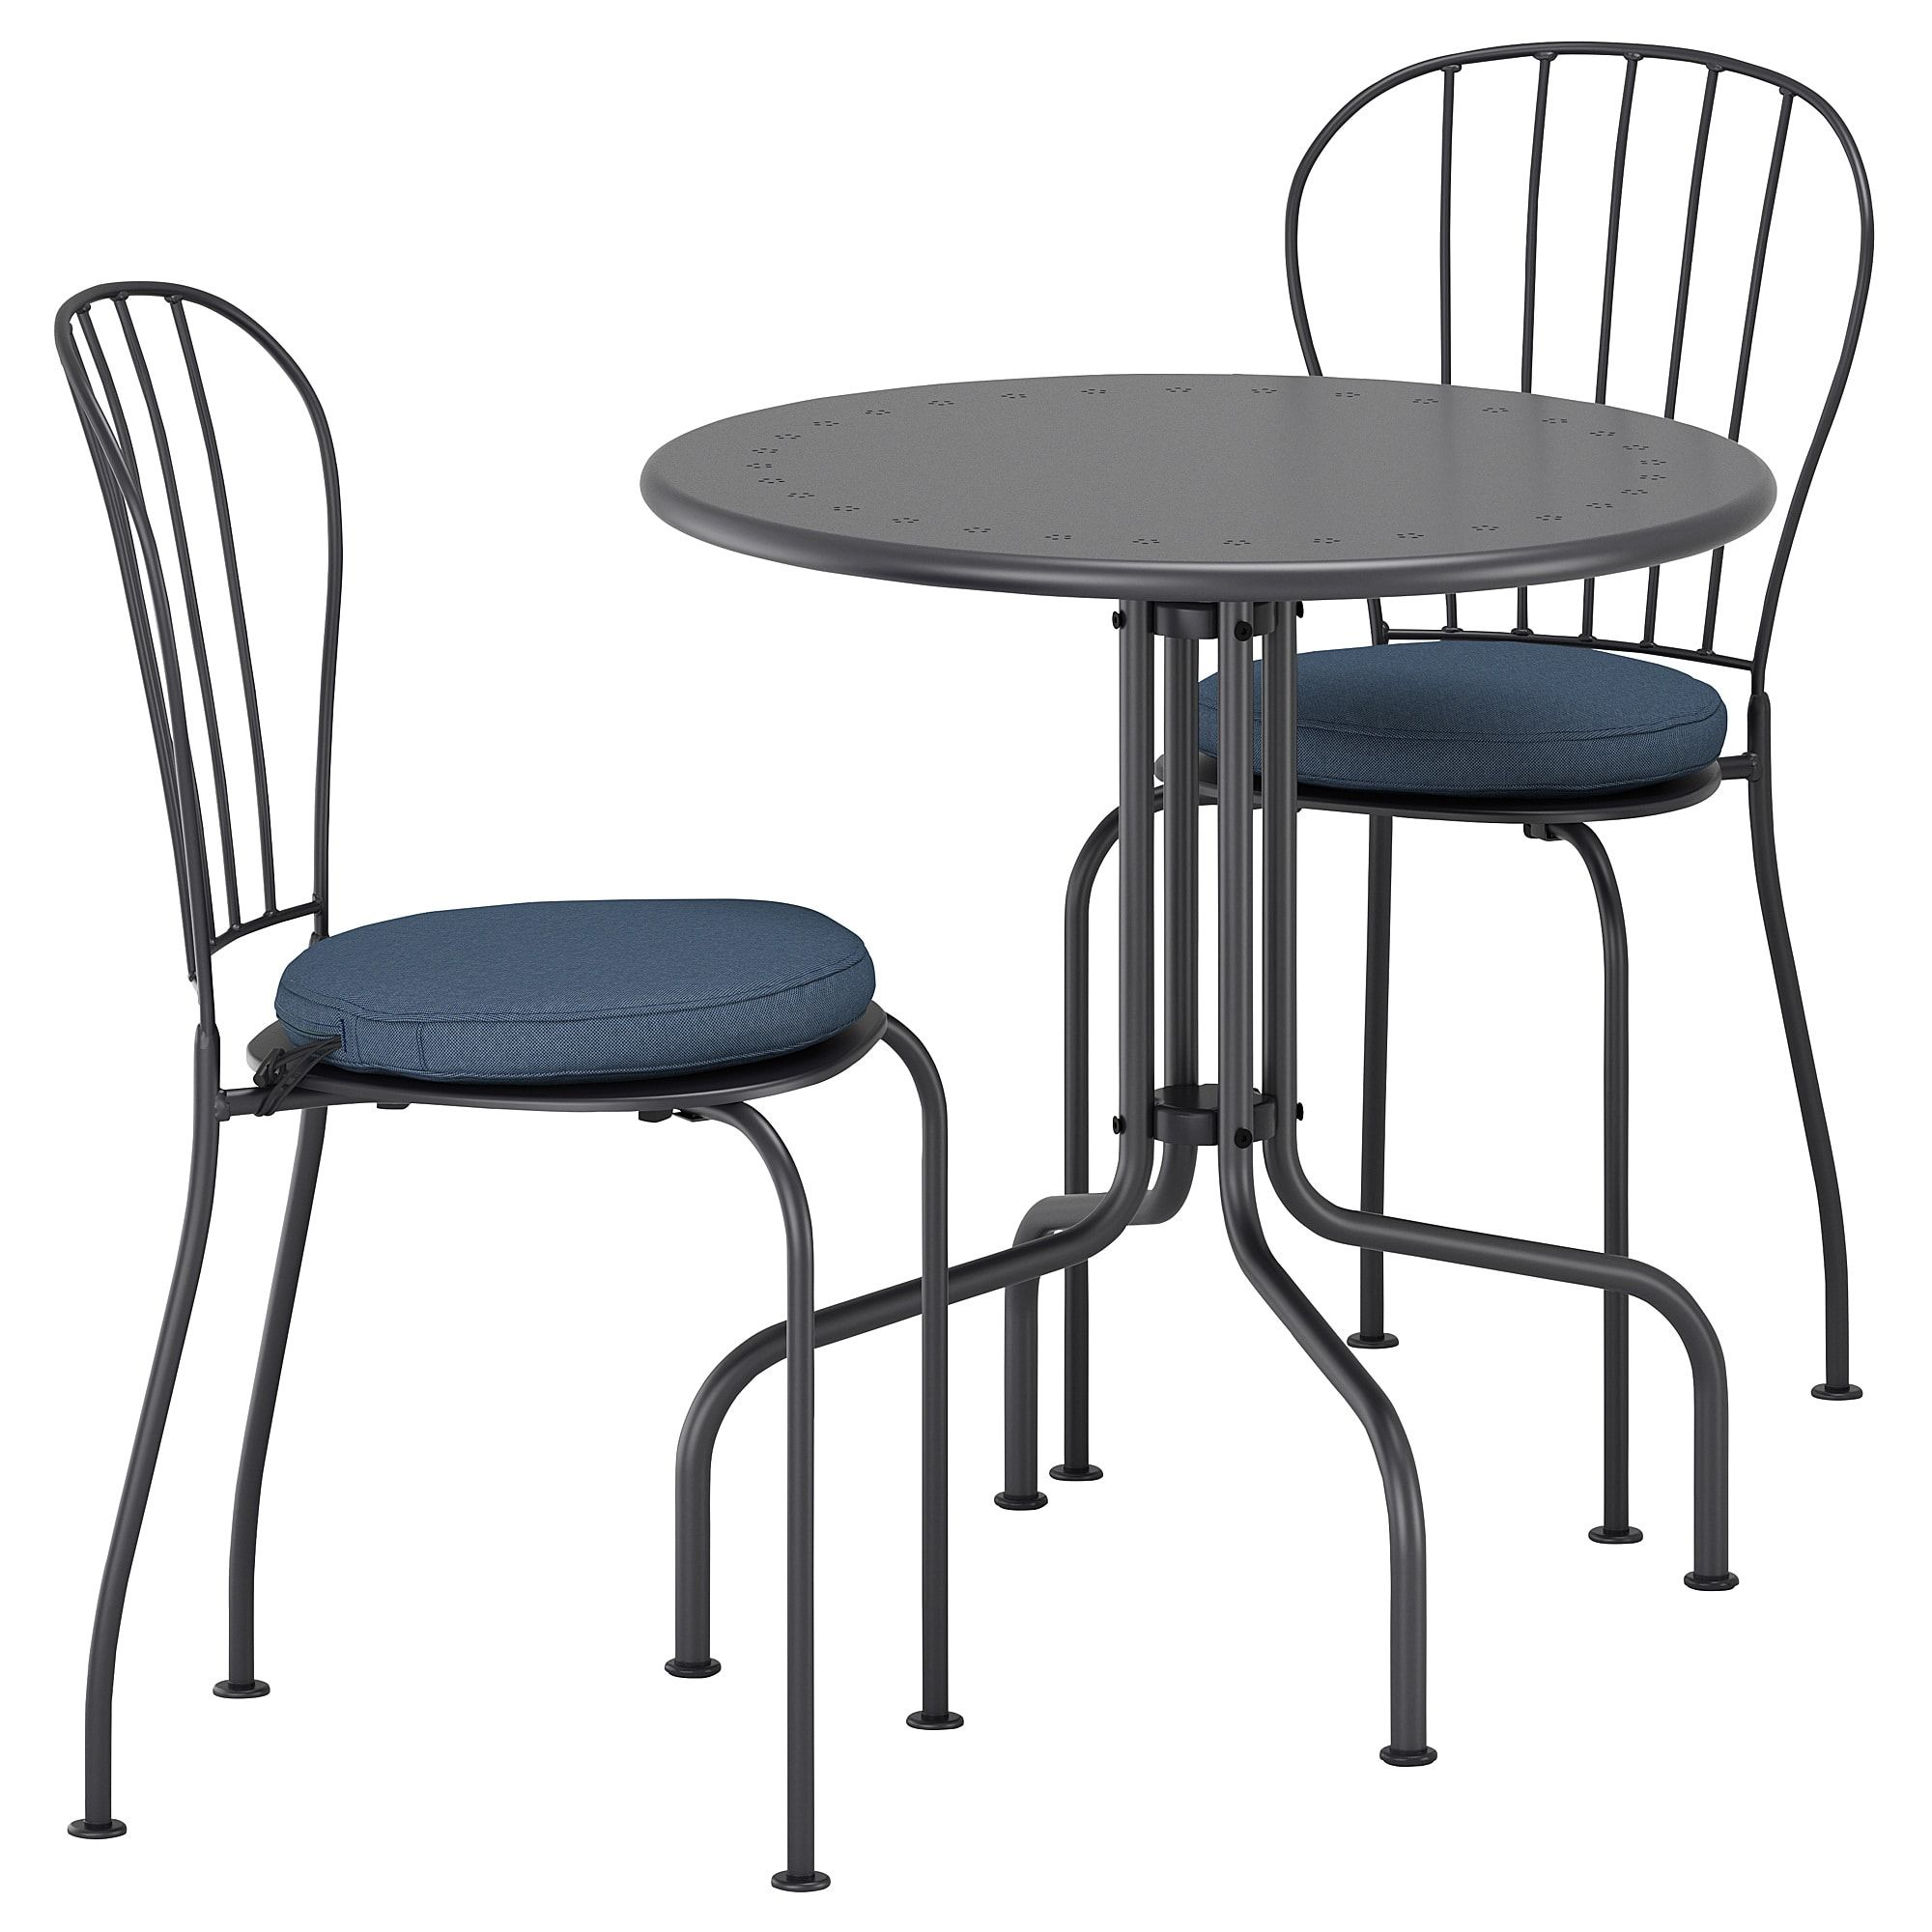 Lacko Tisch 2 Stuhle Aussen Grau Froson Duvholmen Blau